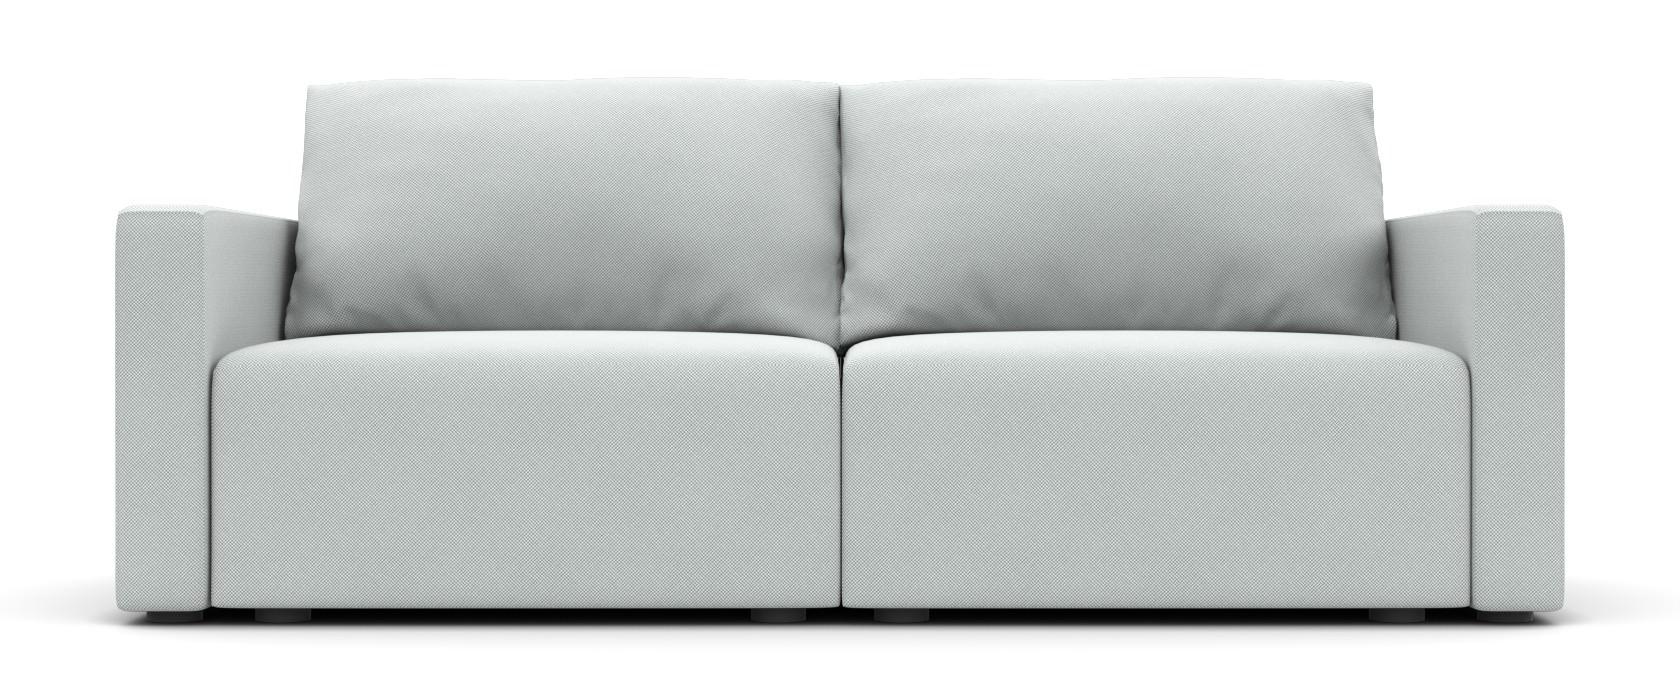 Трехместный диван Greta - Фото 1 - Pufetto